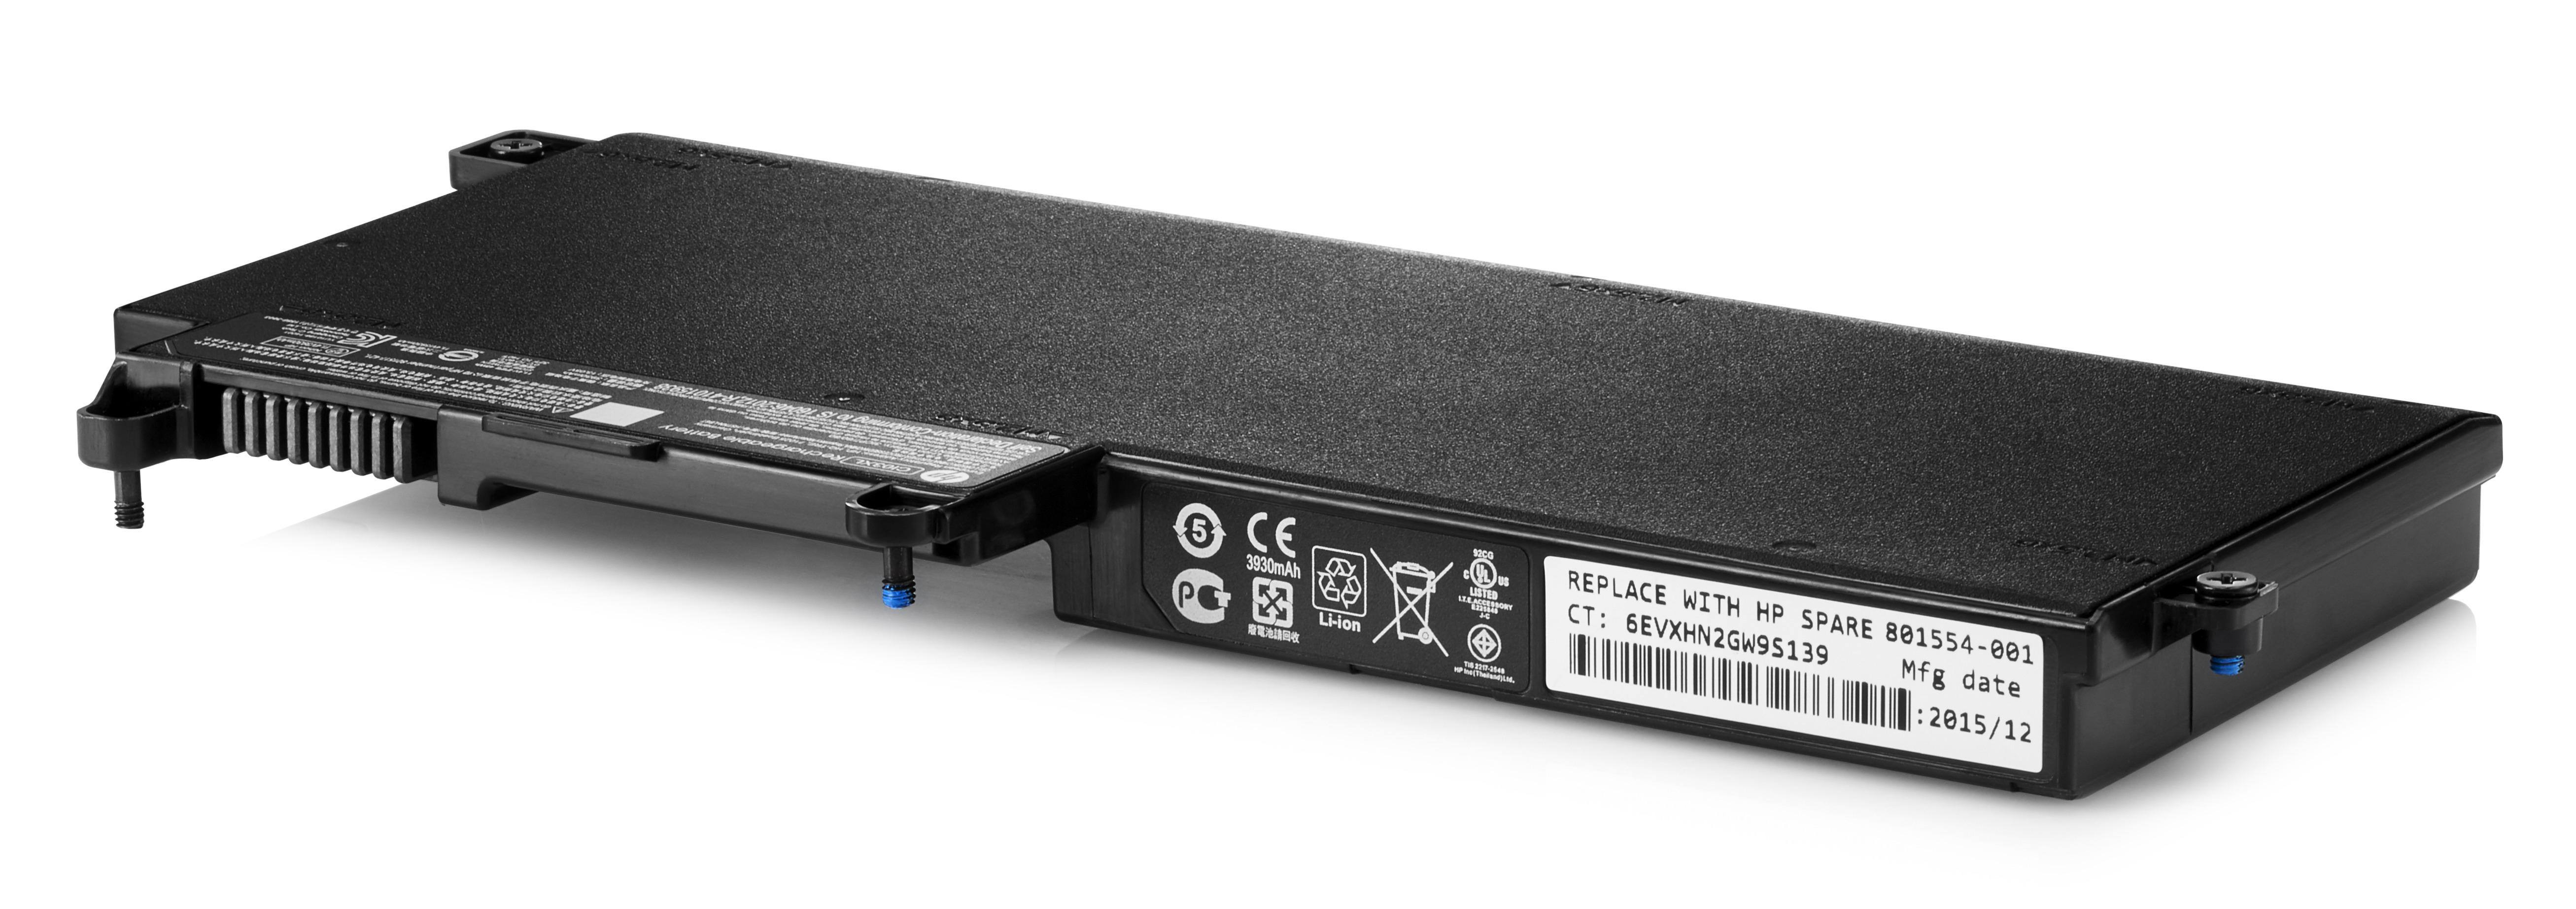 HP CI03XL - Laptop-Batterie (Long Life) - 1 x Lithium